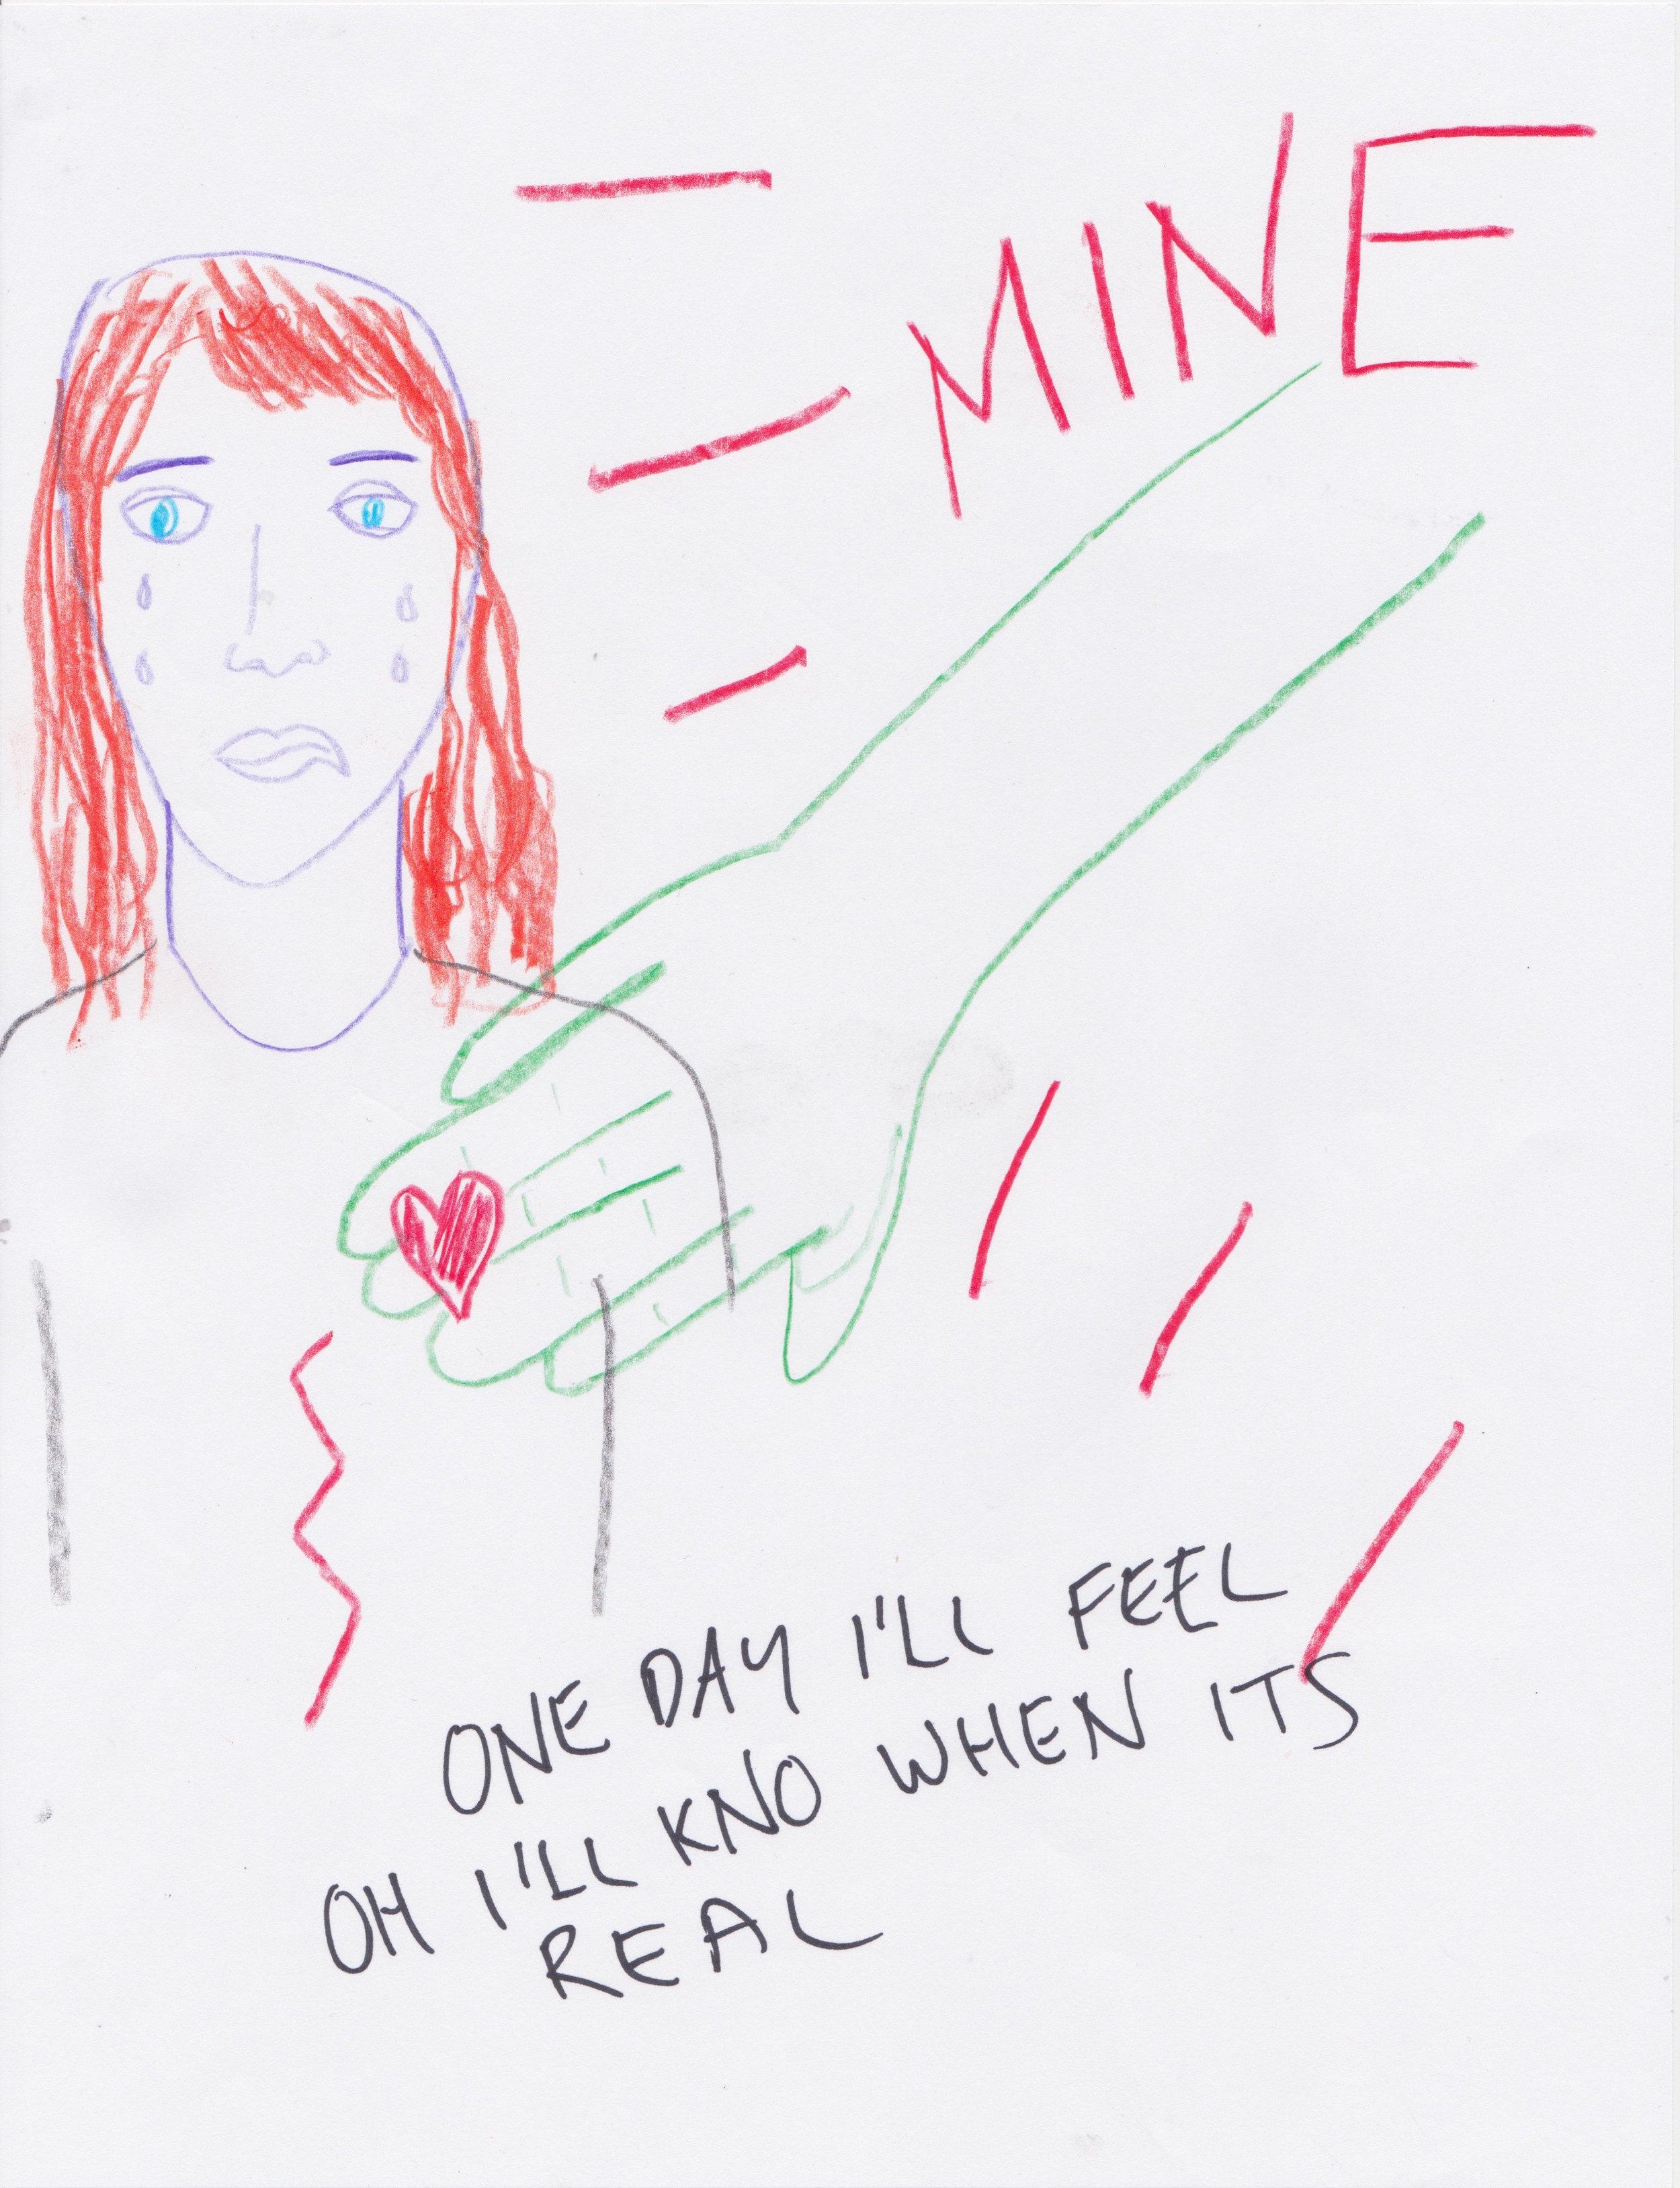 Illustration by Ava Trilling, Leader Vocalist